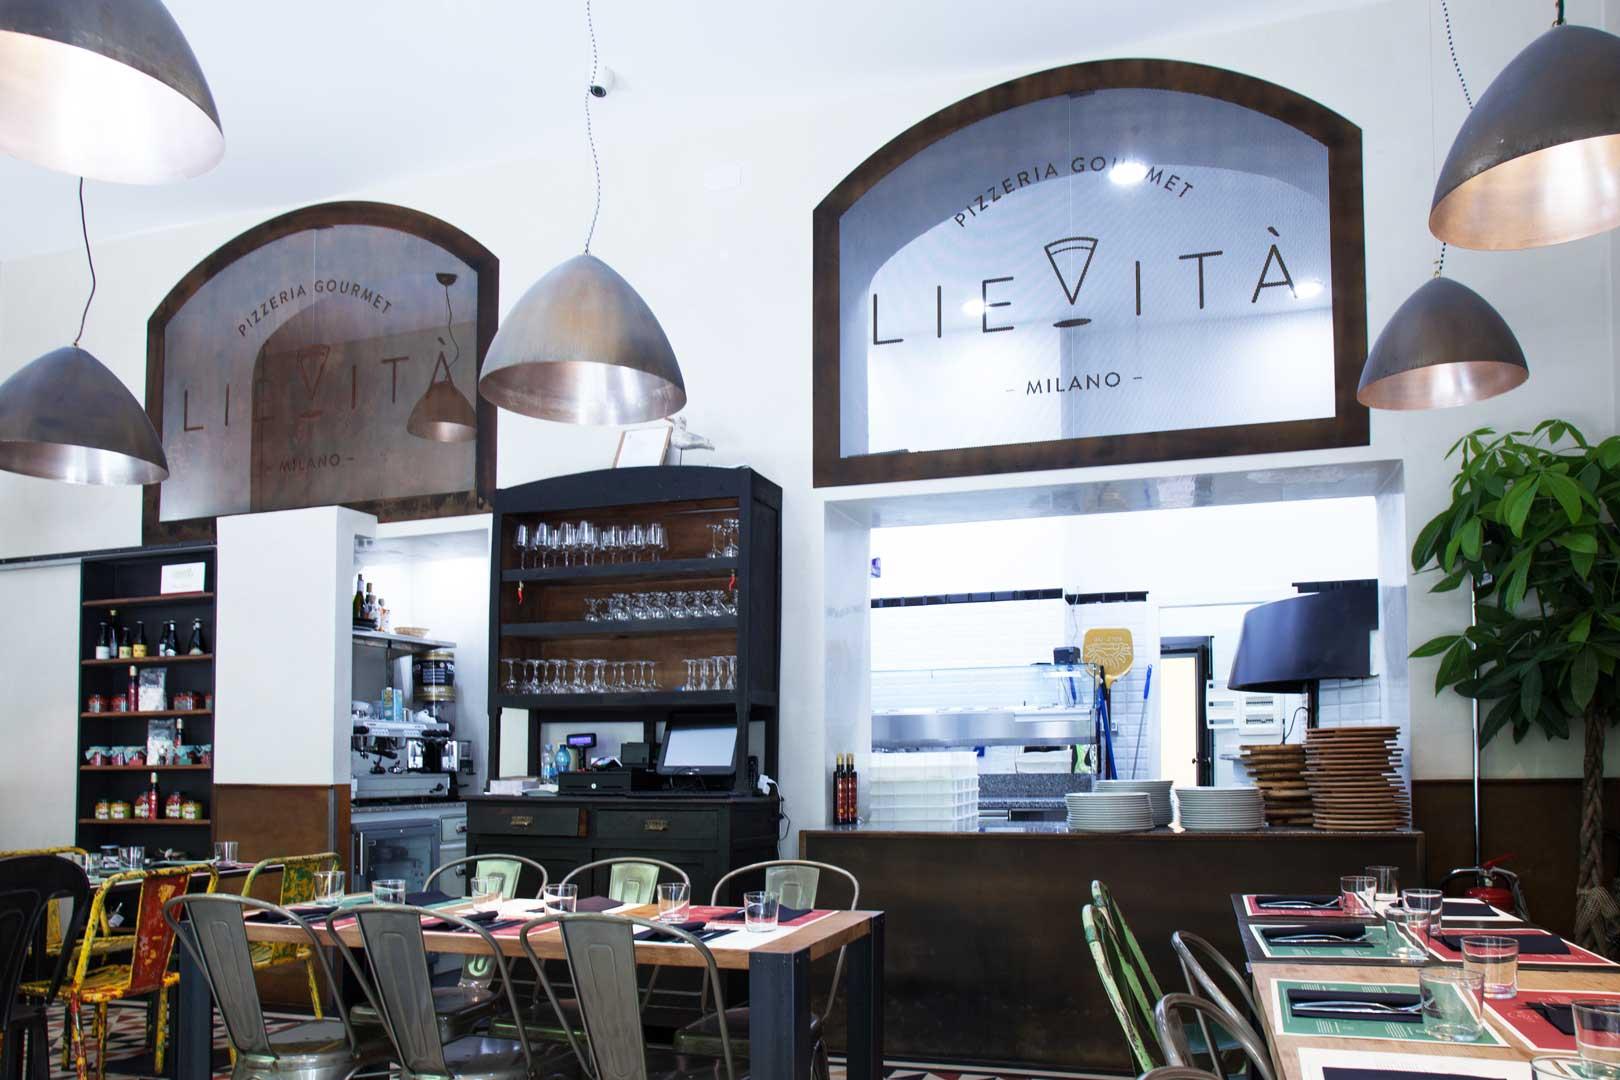 Lievità - Pizzeria Gourmet